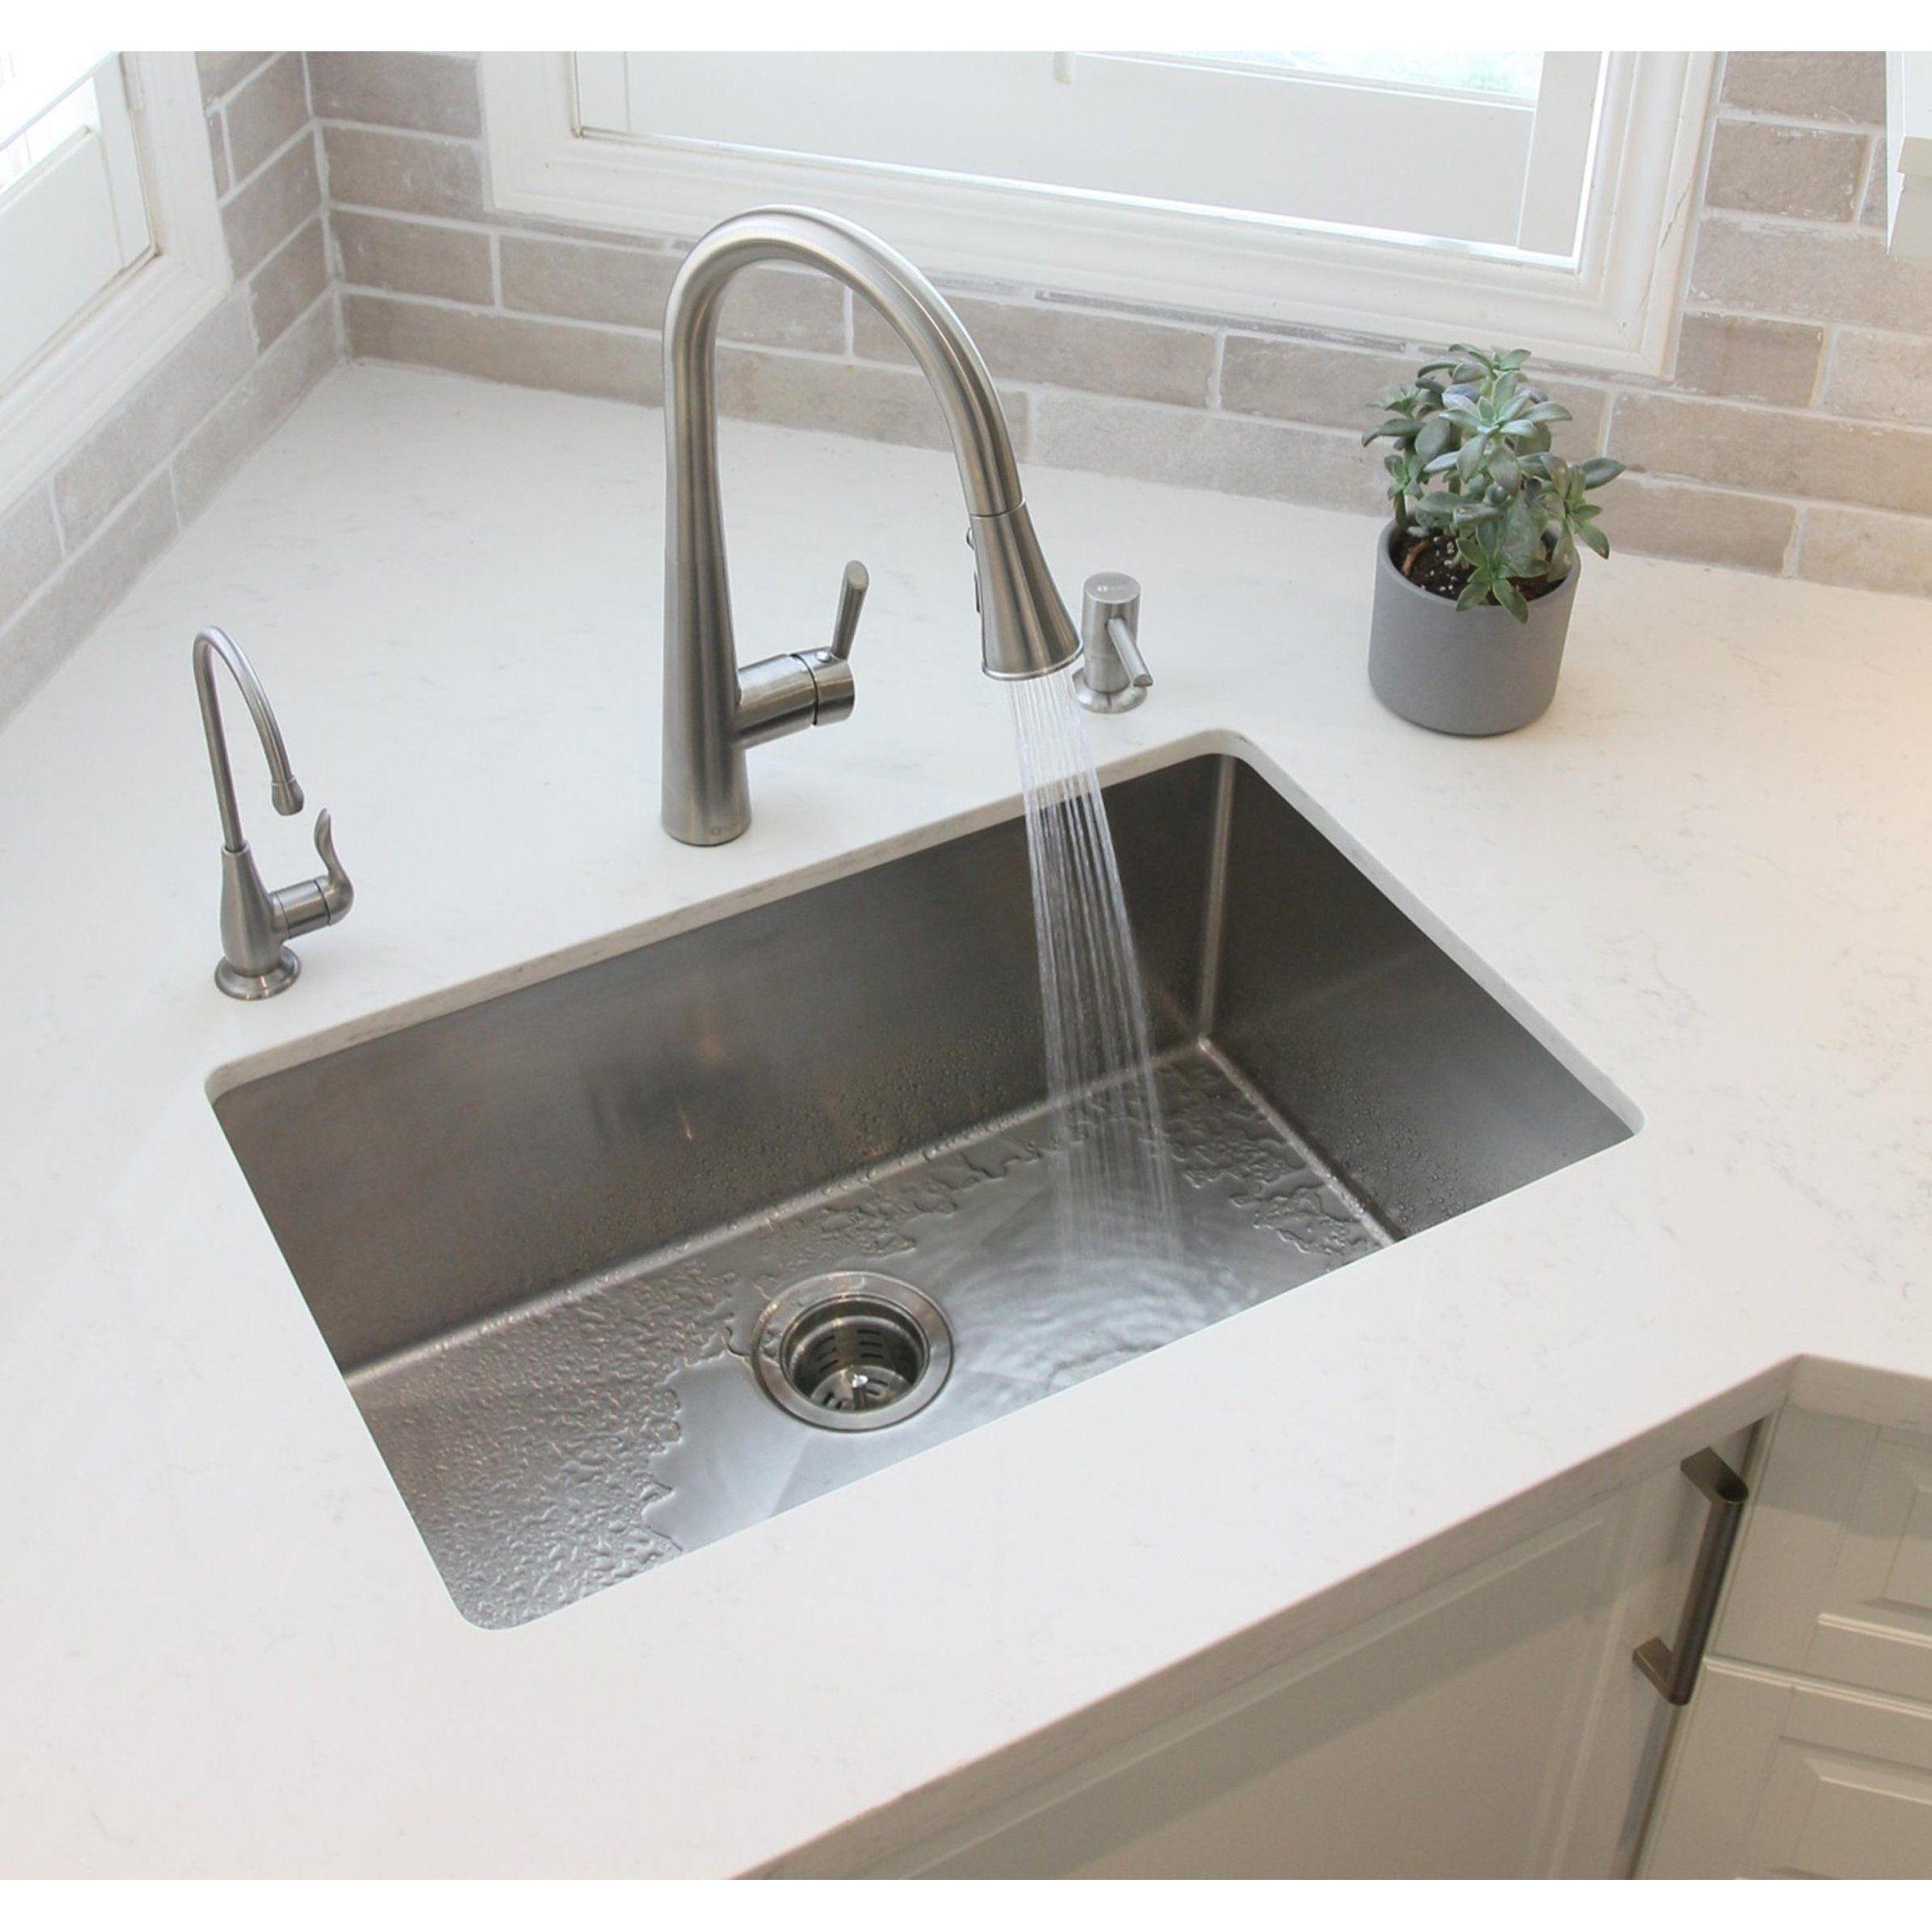 28 Undermount Single Bowl Kitchen Sink 18g Stainless Steel S 306